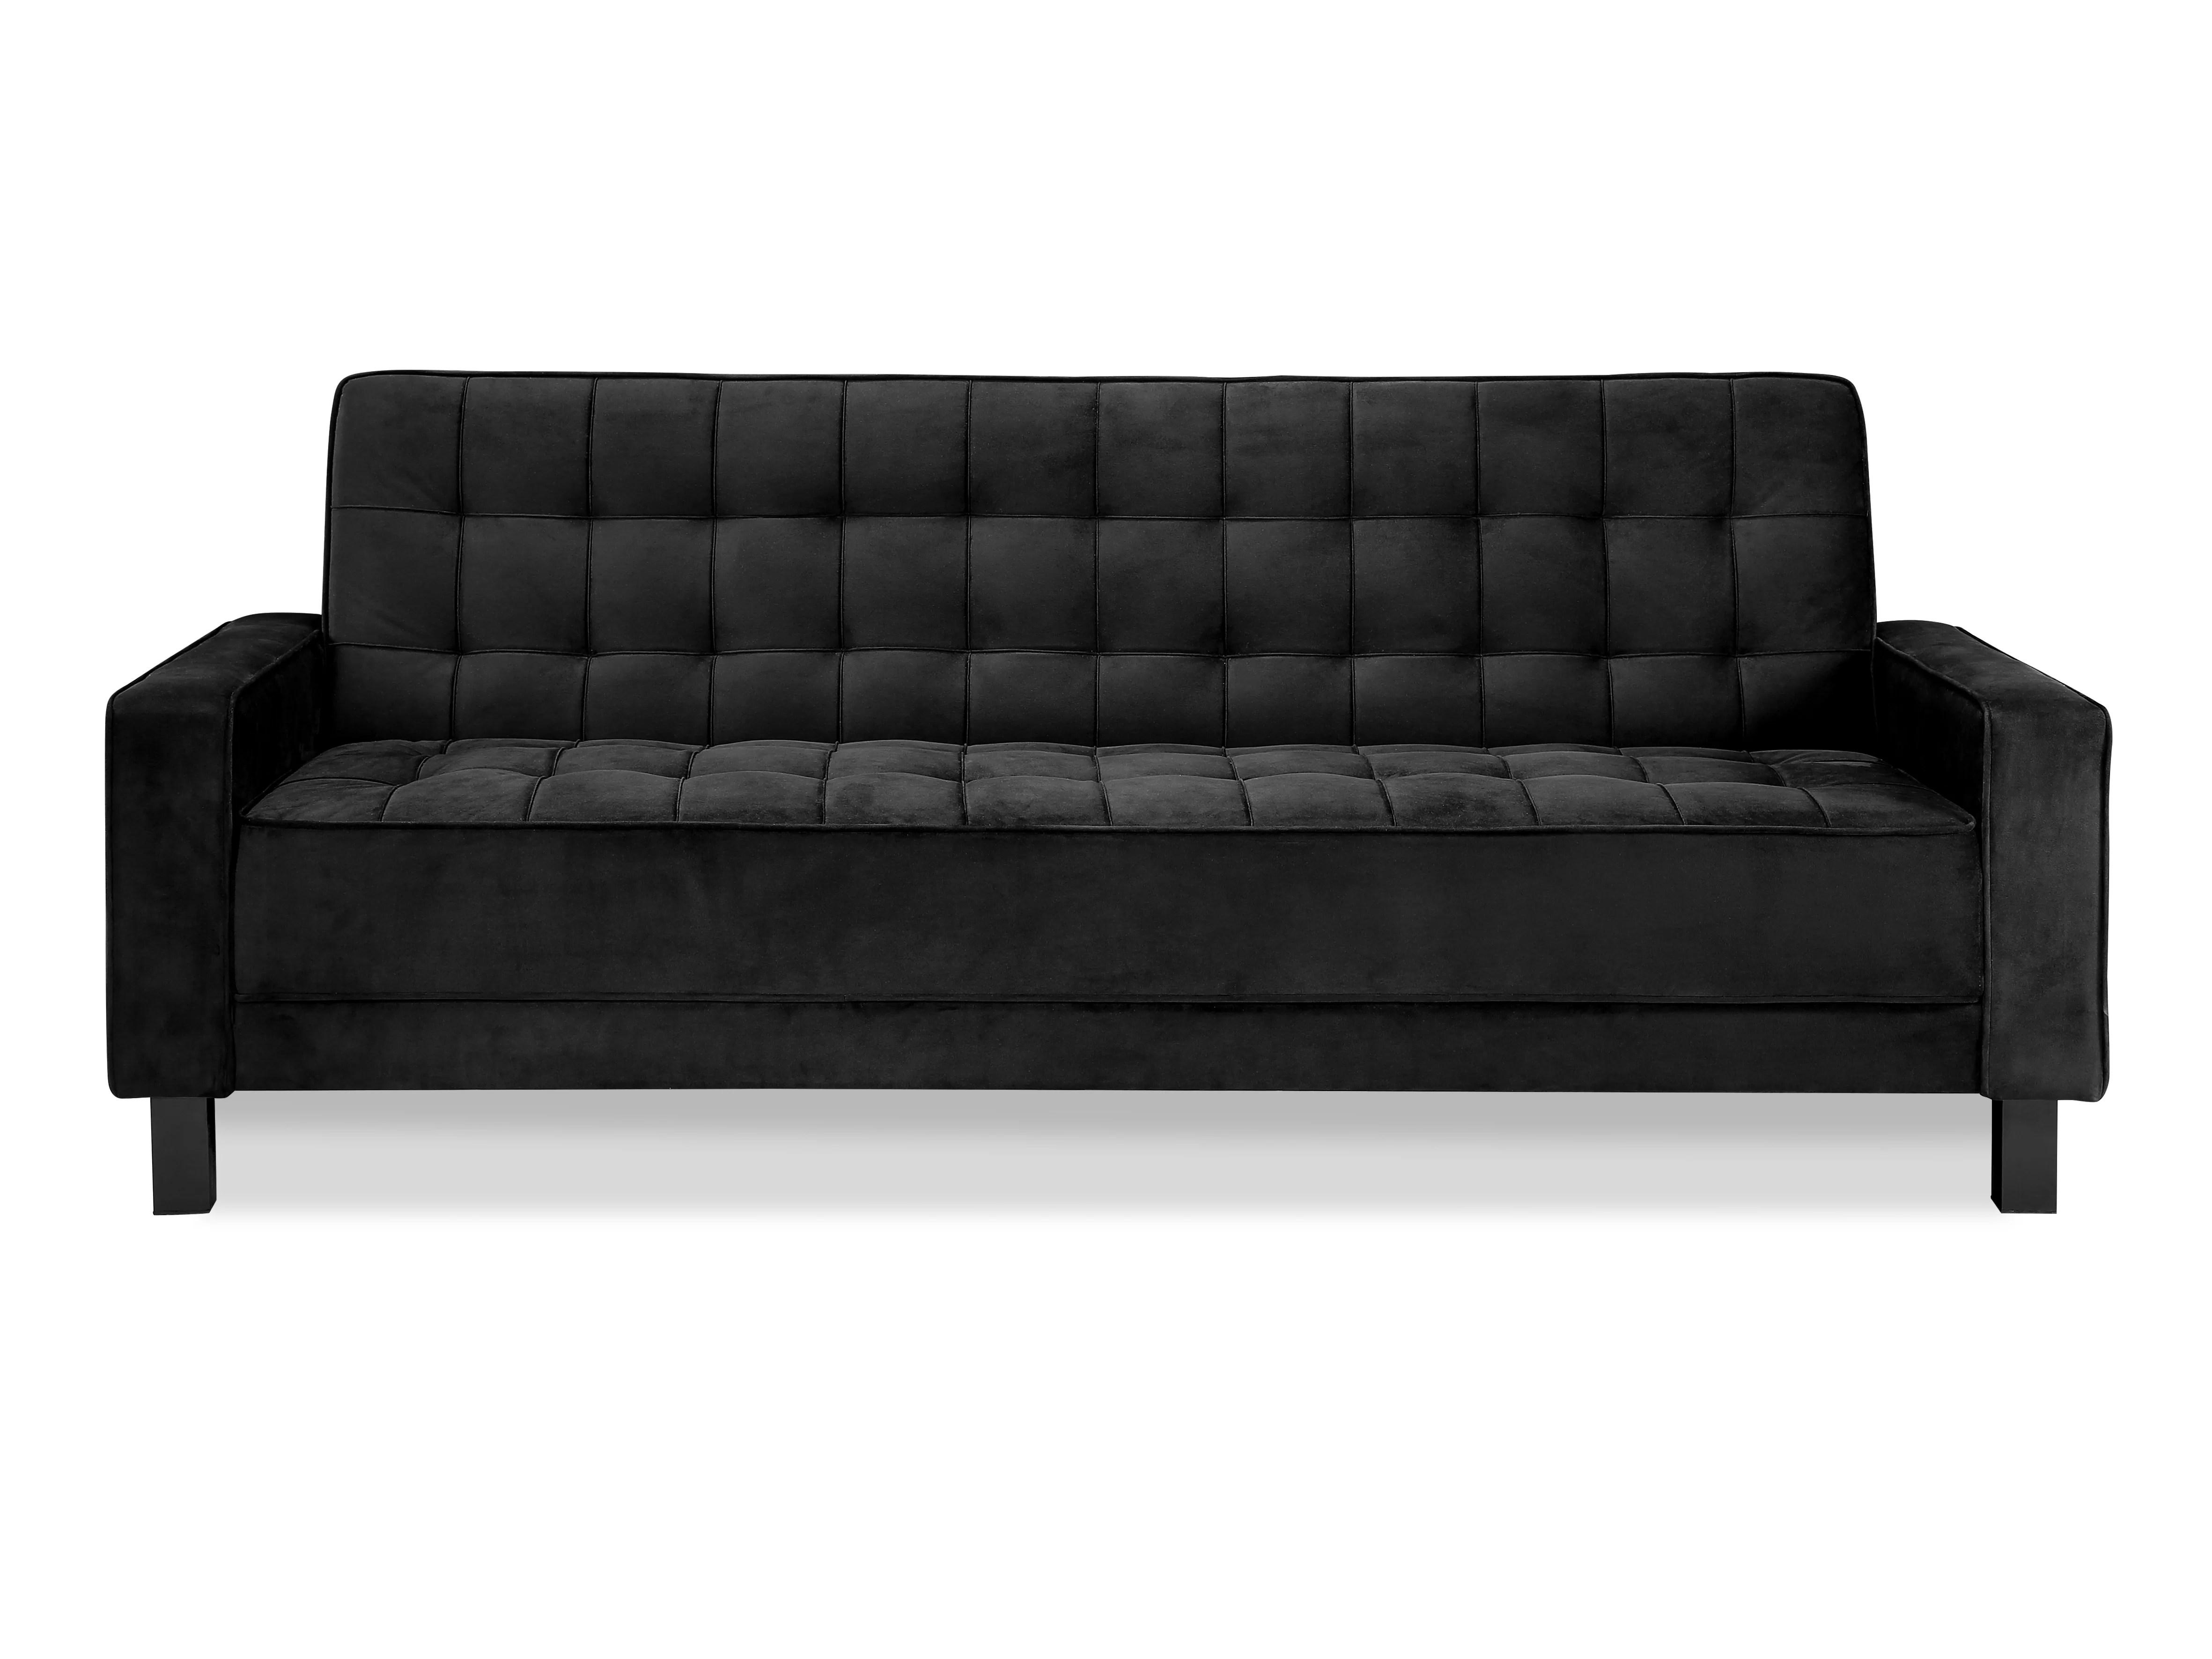 sleeper sofas chicago il red chenille sofa serta futons manhattan reviews wayfair